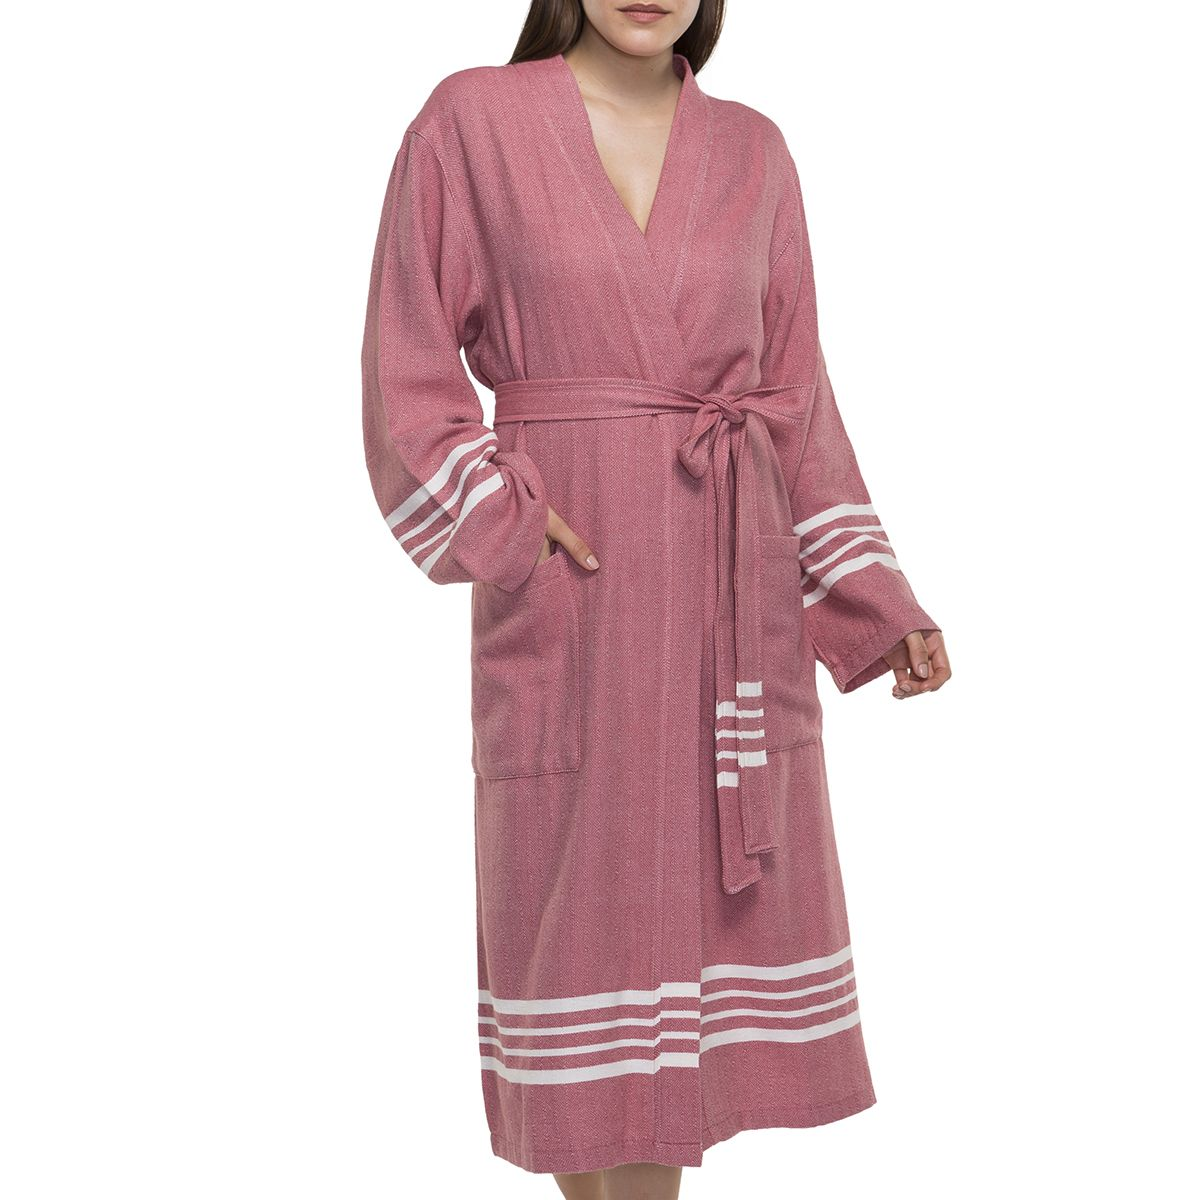 Bathrobe Sultan Kimono - Dusty Rose